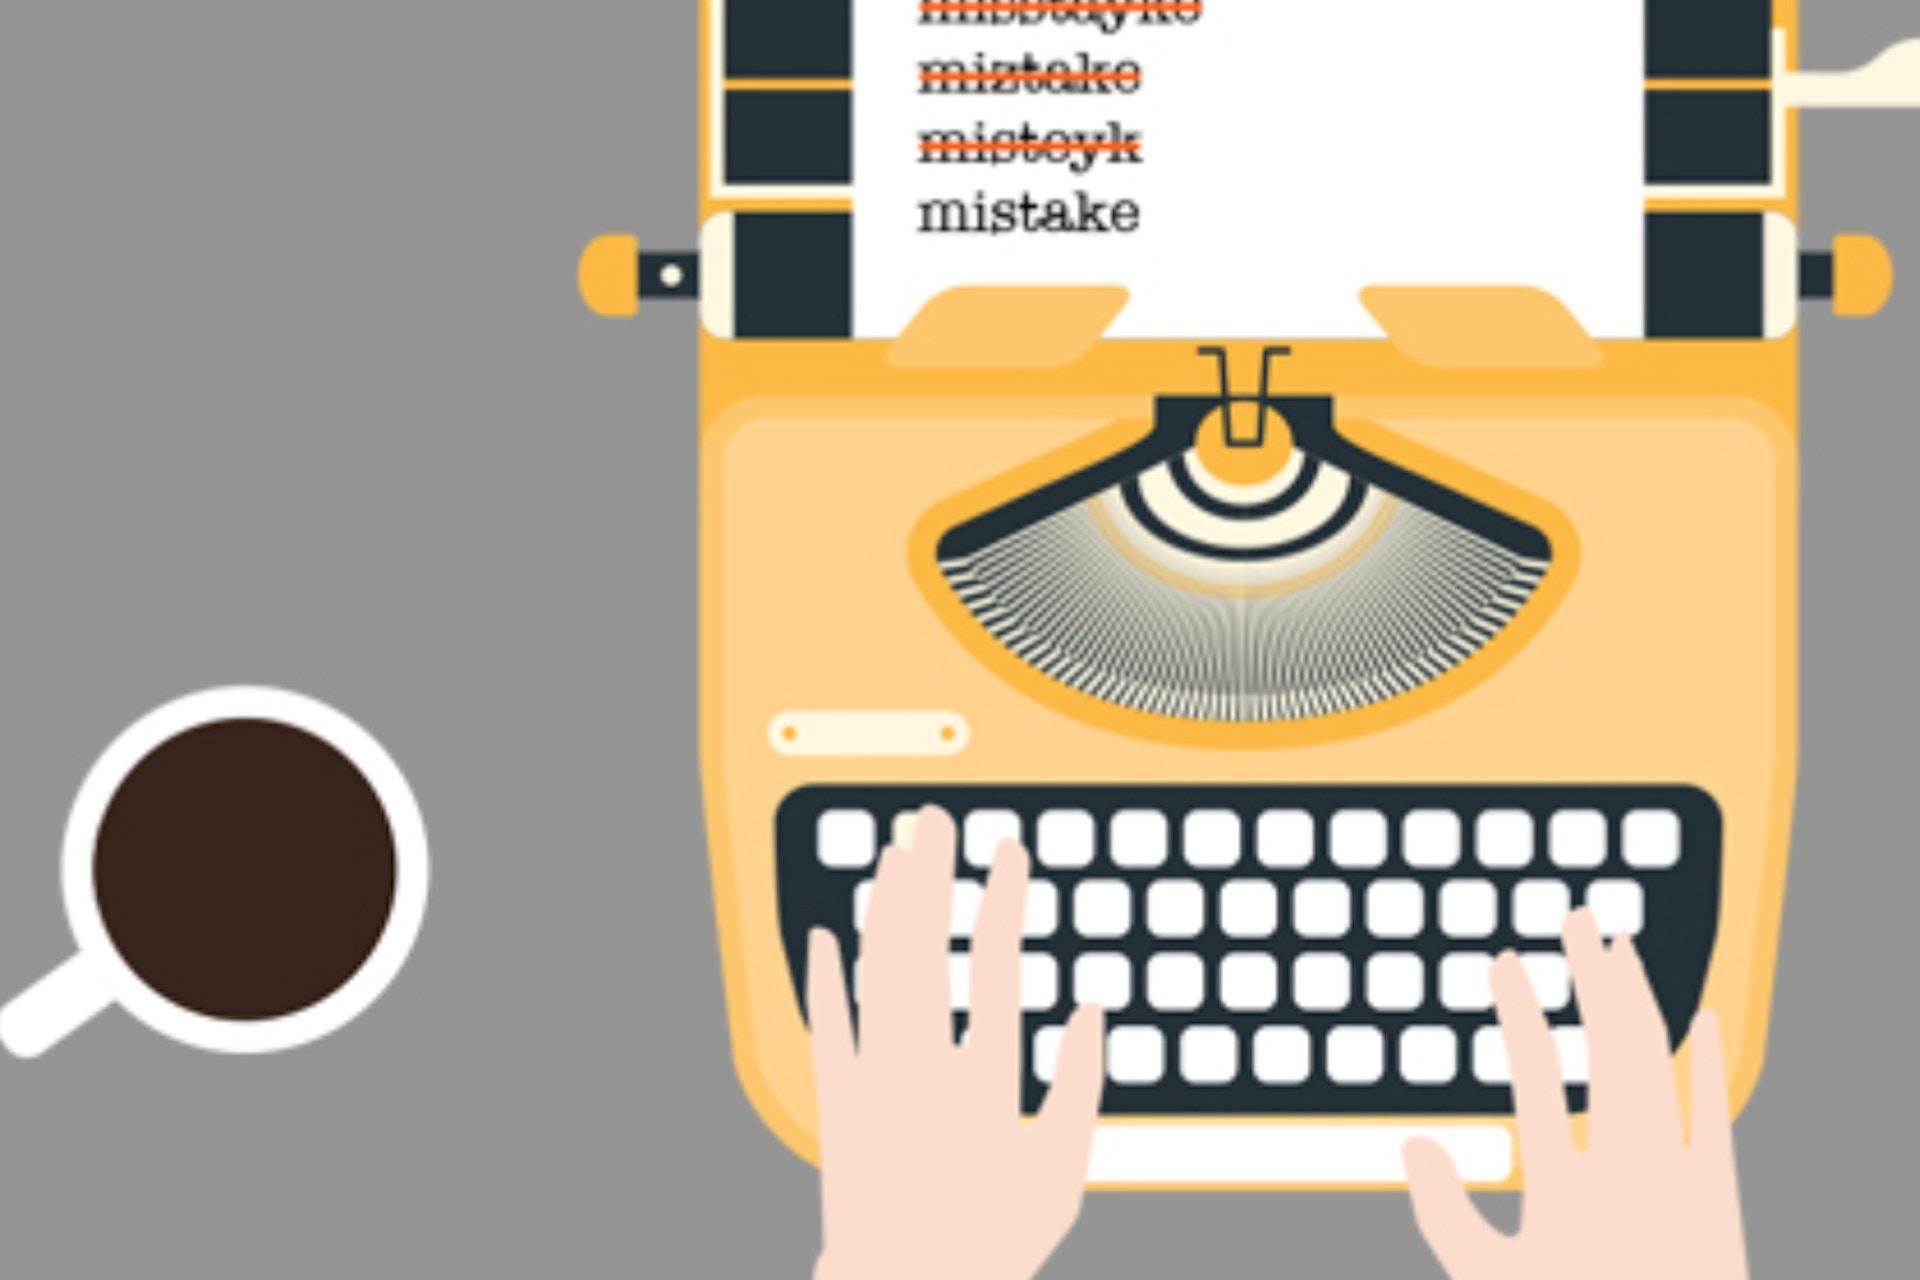 b2b social media marketing mistakes to avoid